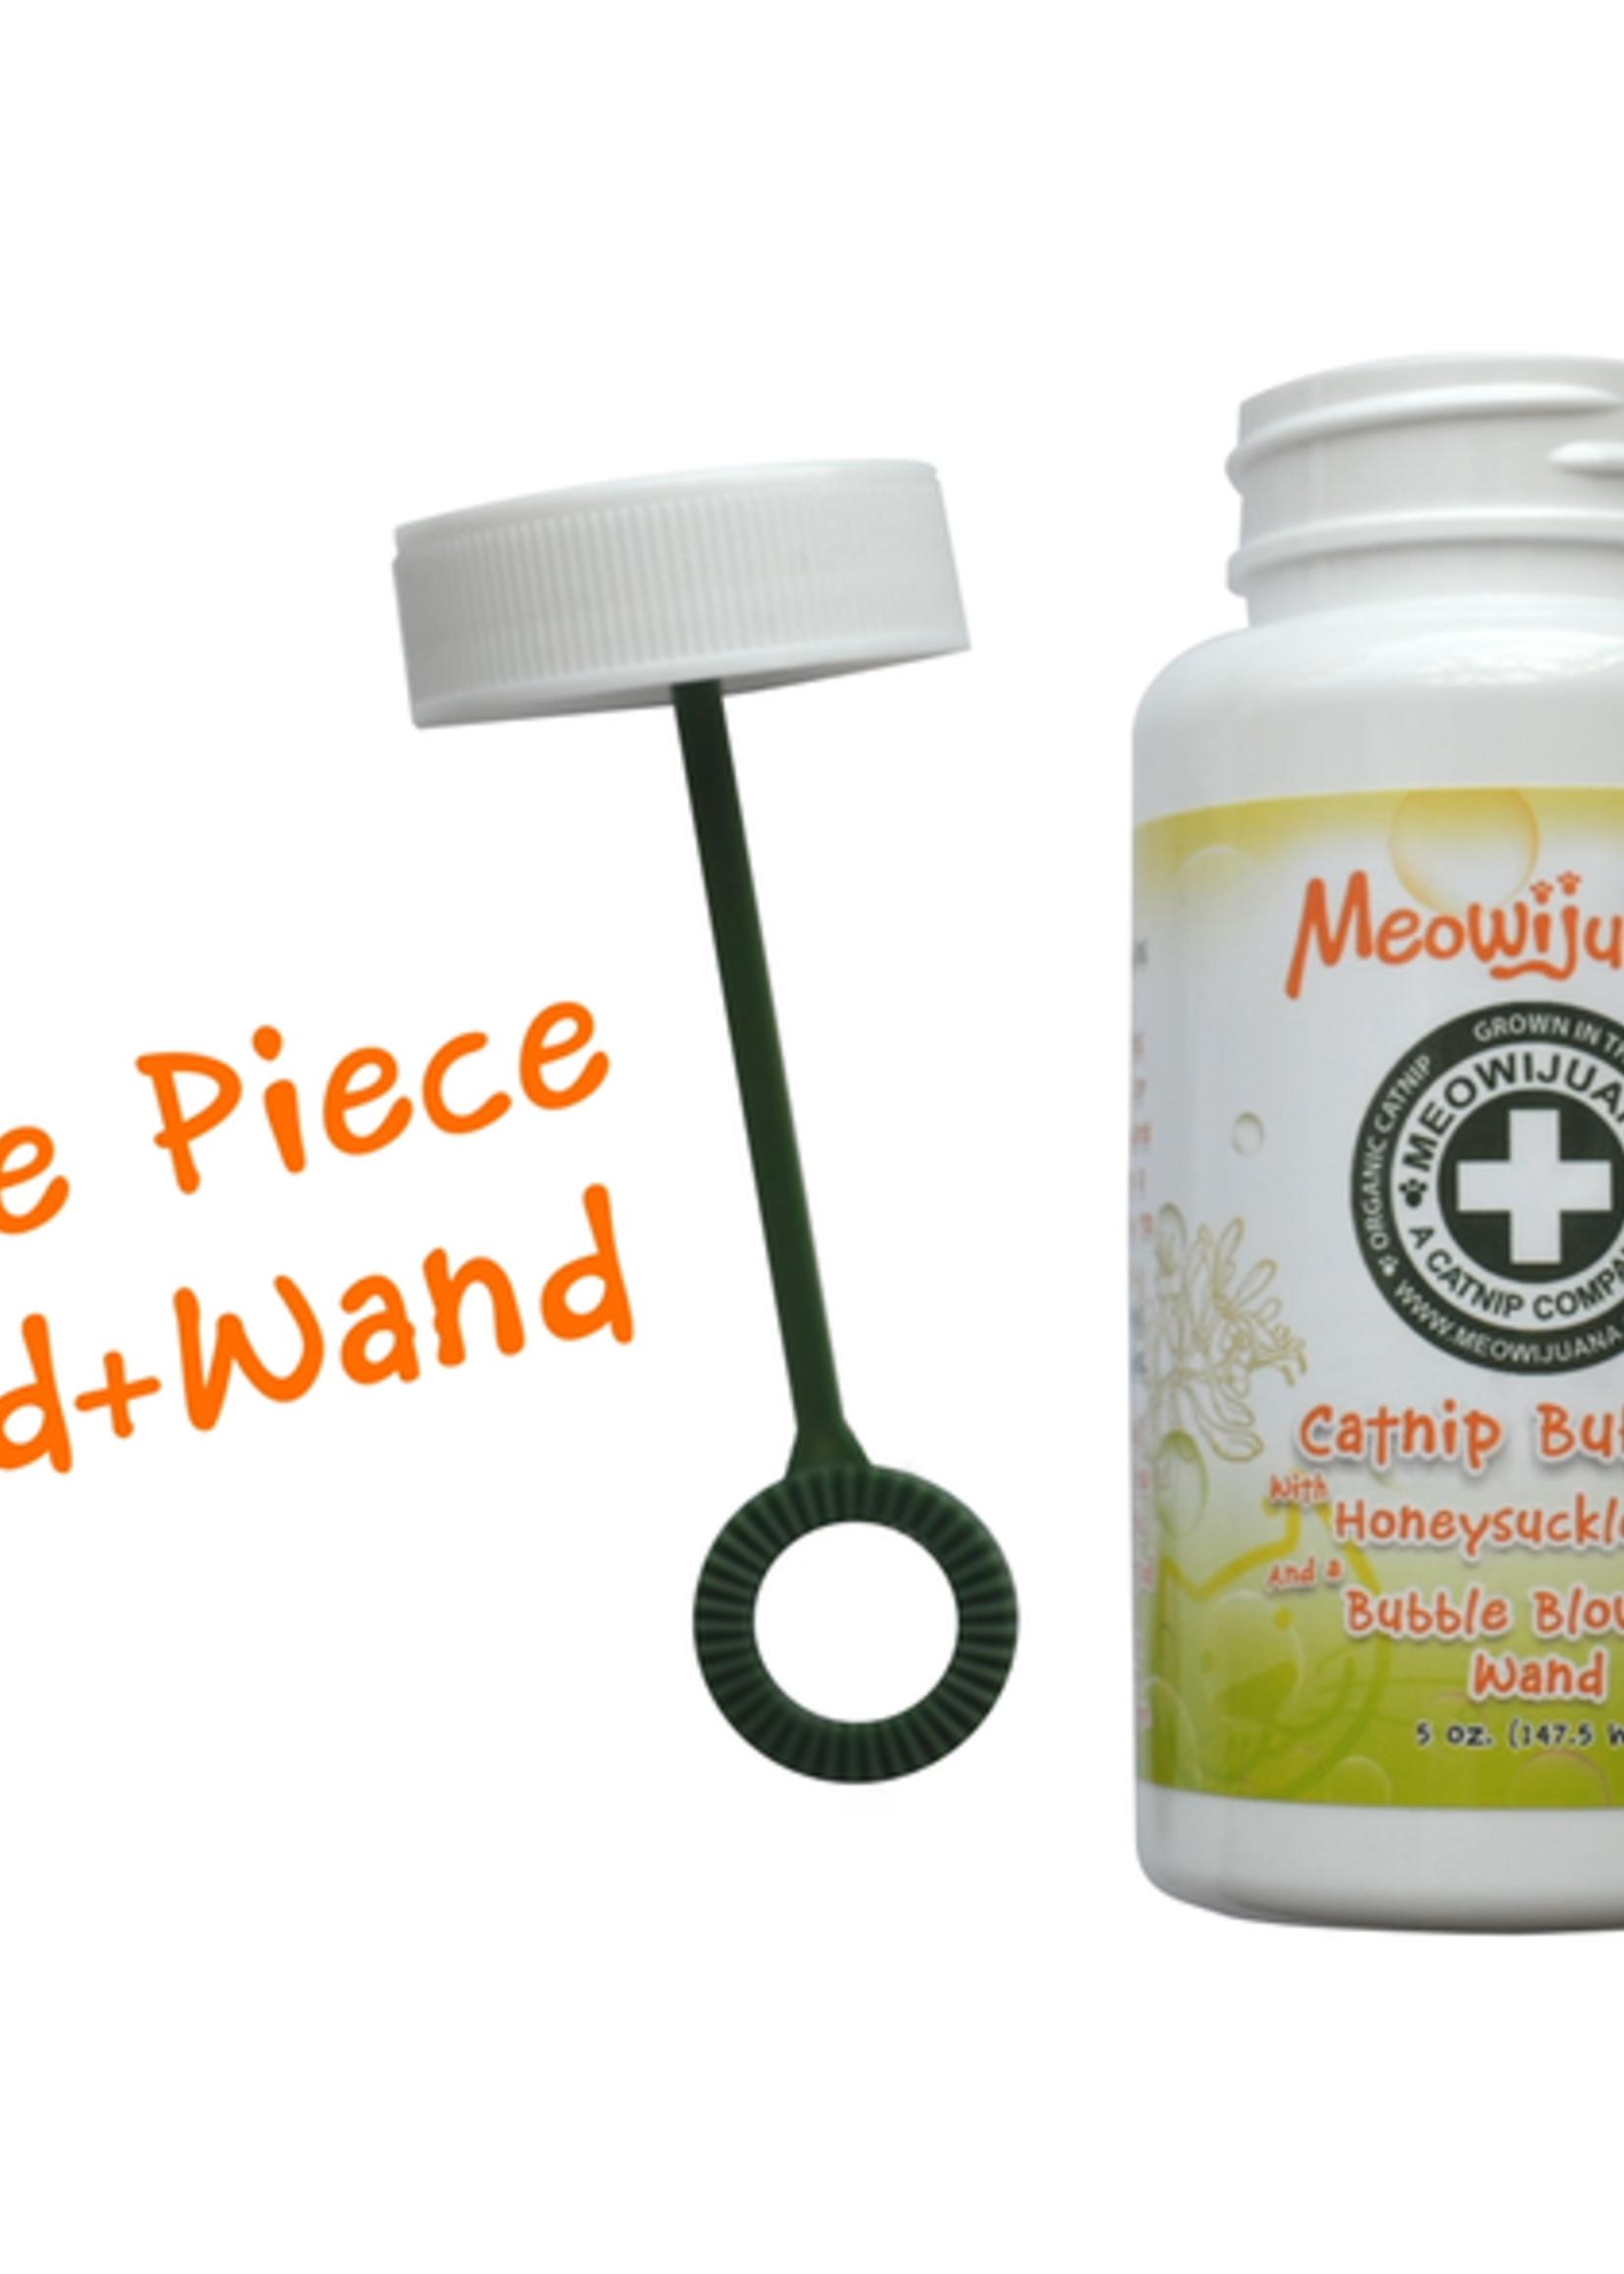 Meowijuana Catnip Bubbles w/ Honey Suckle Oil 5 oz